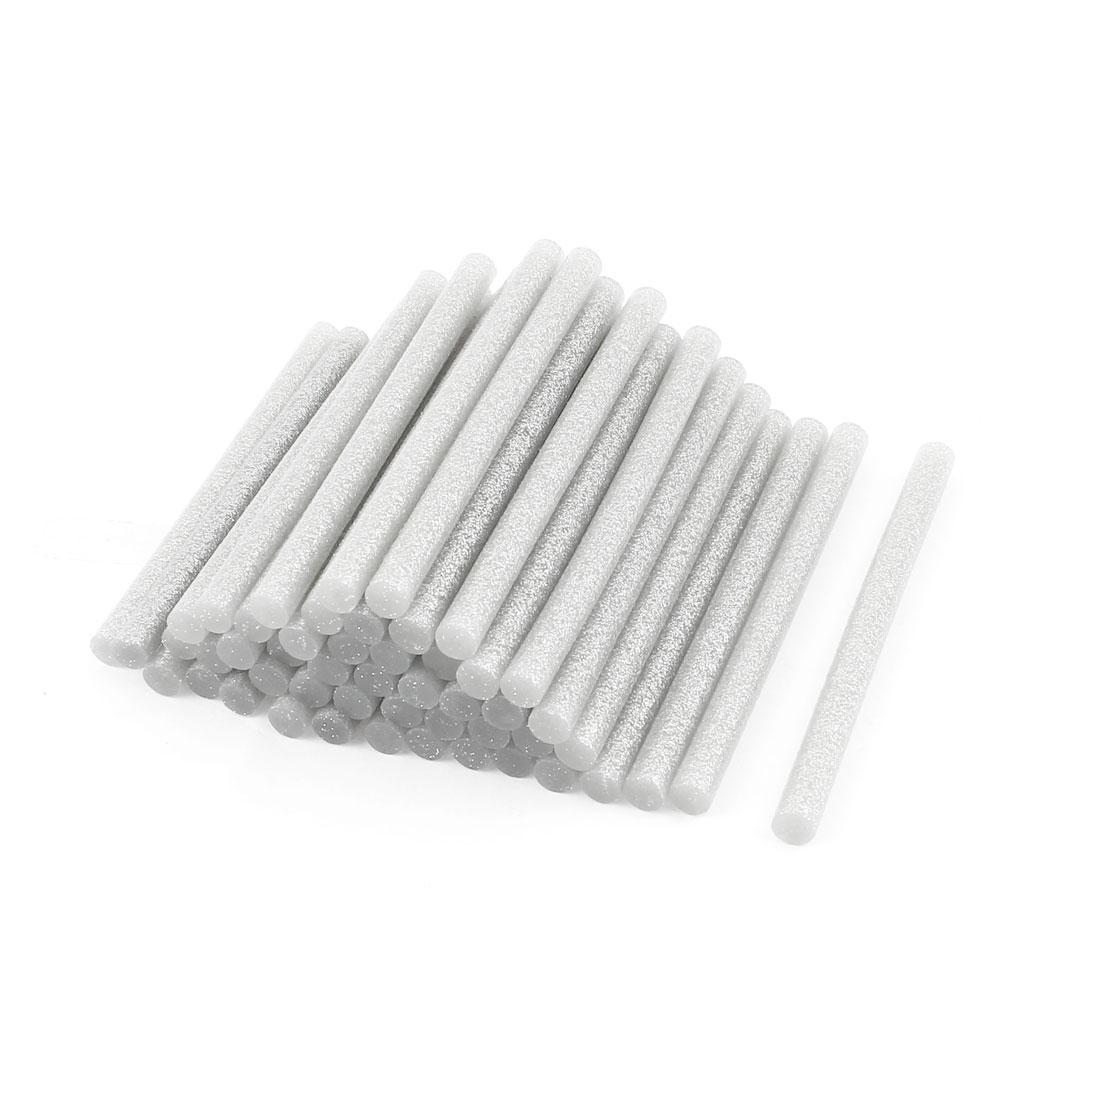 50 Pcs 7mm Diameter 100mm Length Crafting Model Silver Tone Hot Melt Glue Sticks